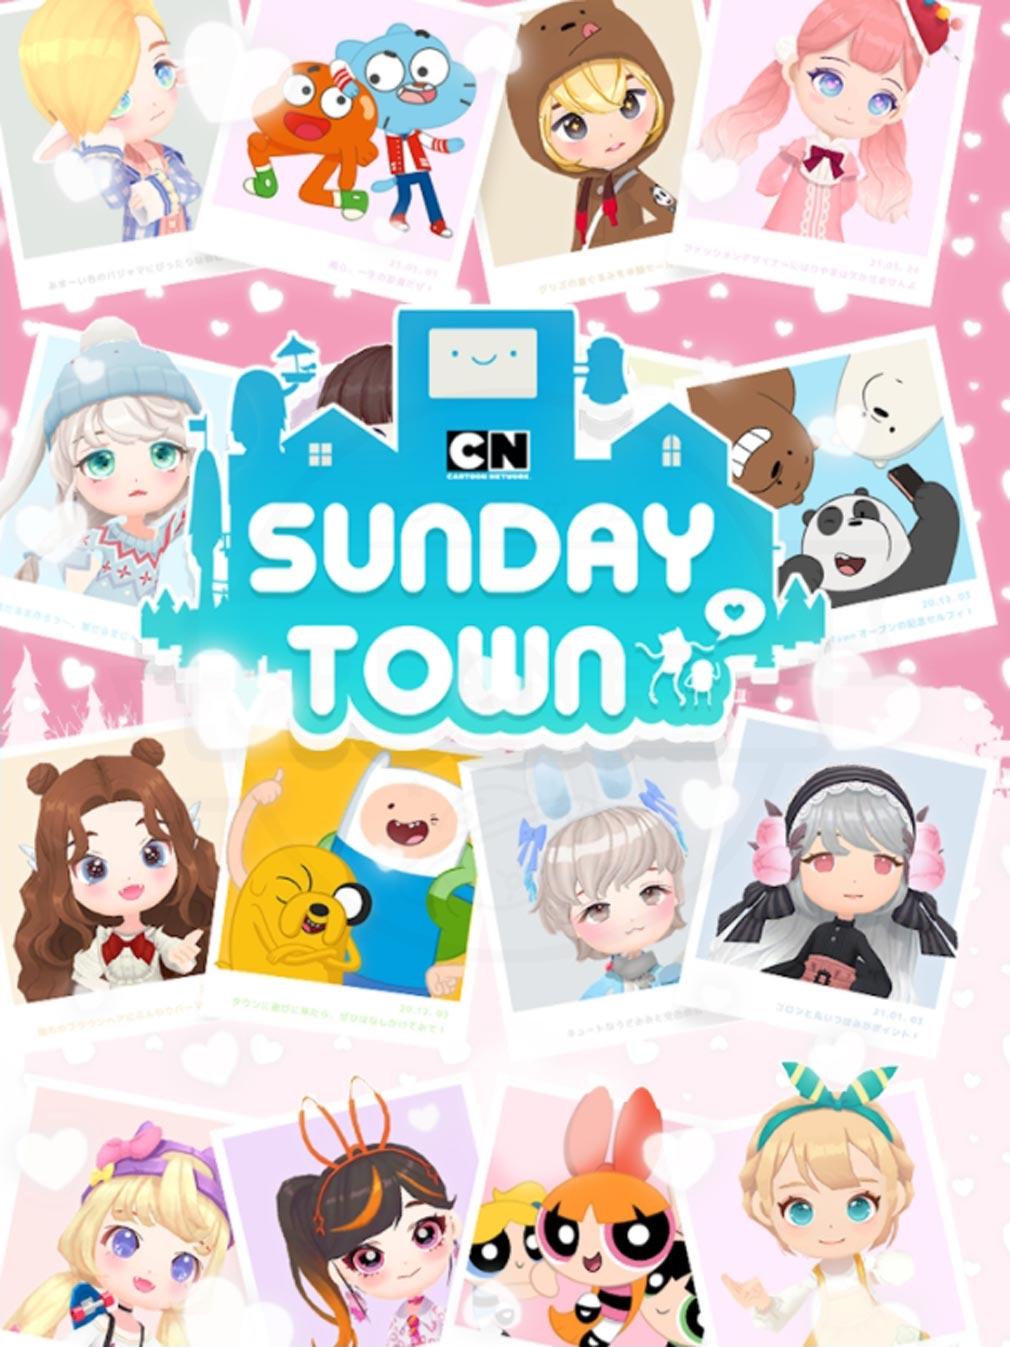 Cartoon Network SundayTown(カートゥーン・ネットワーク サンデータウン) キービジュアル